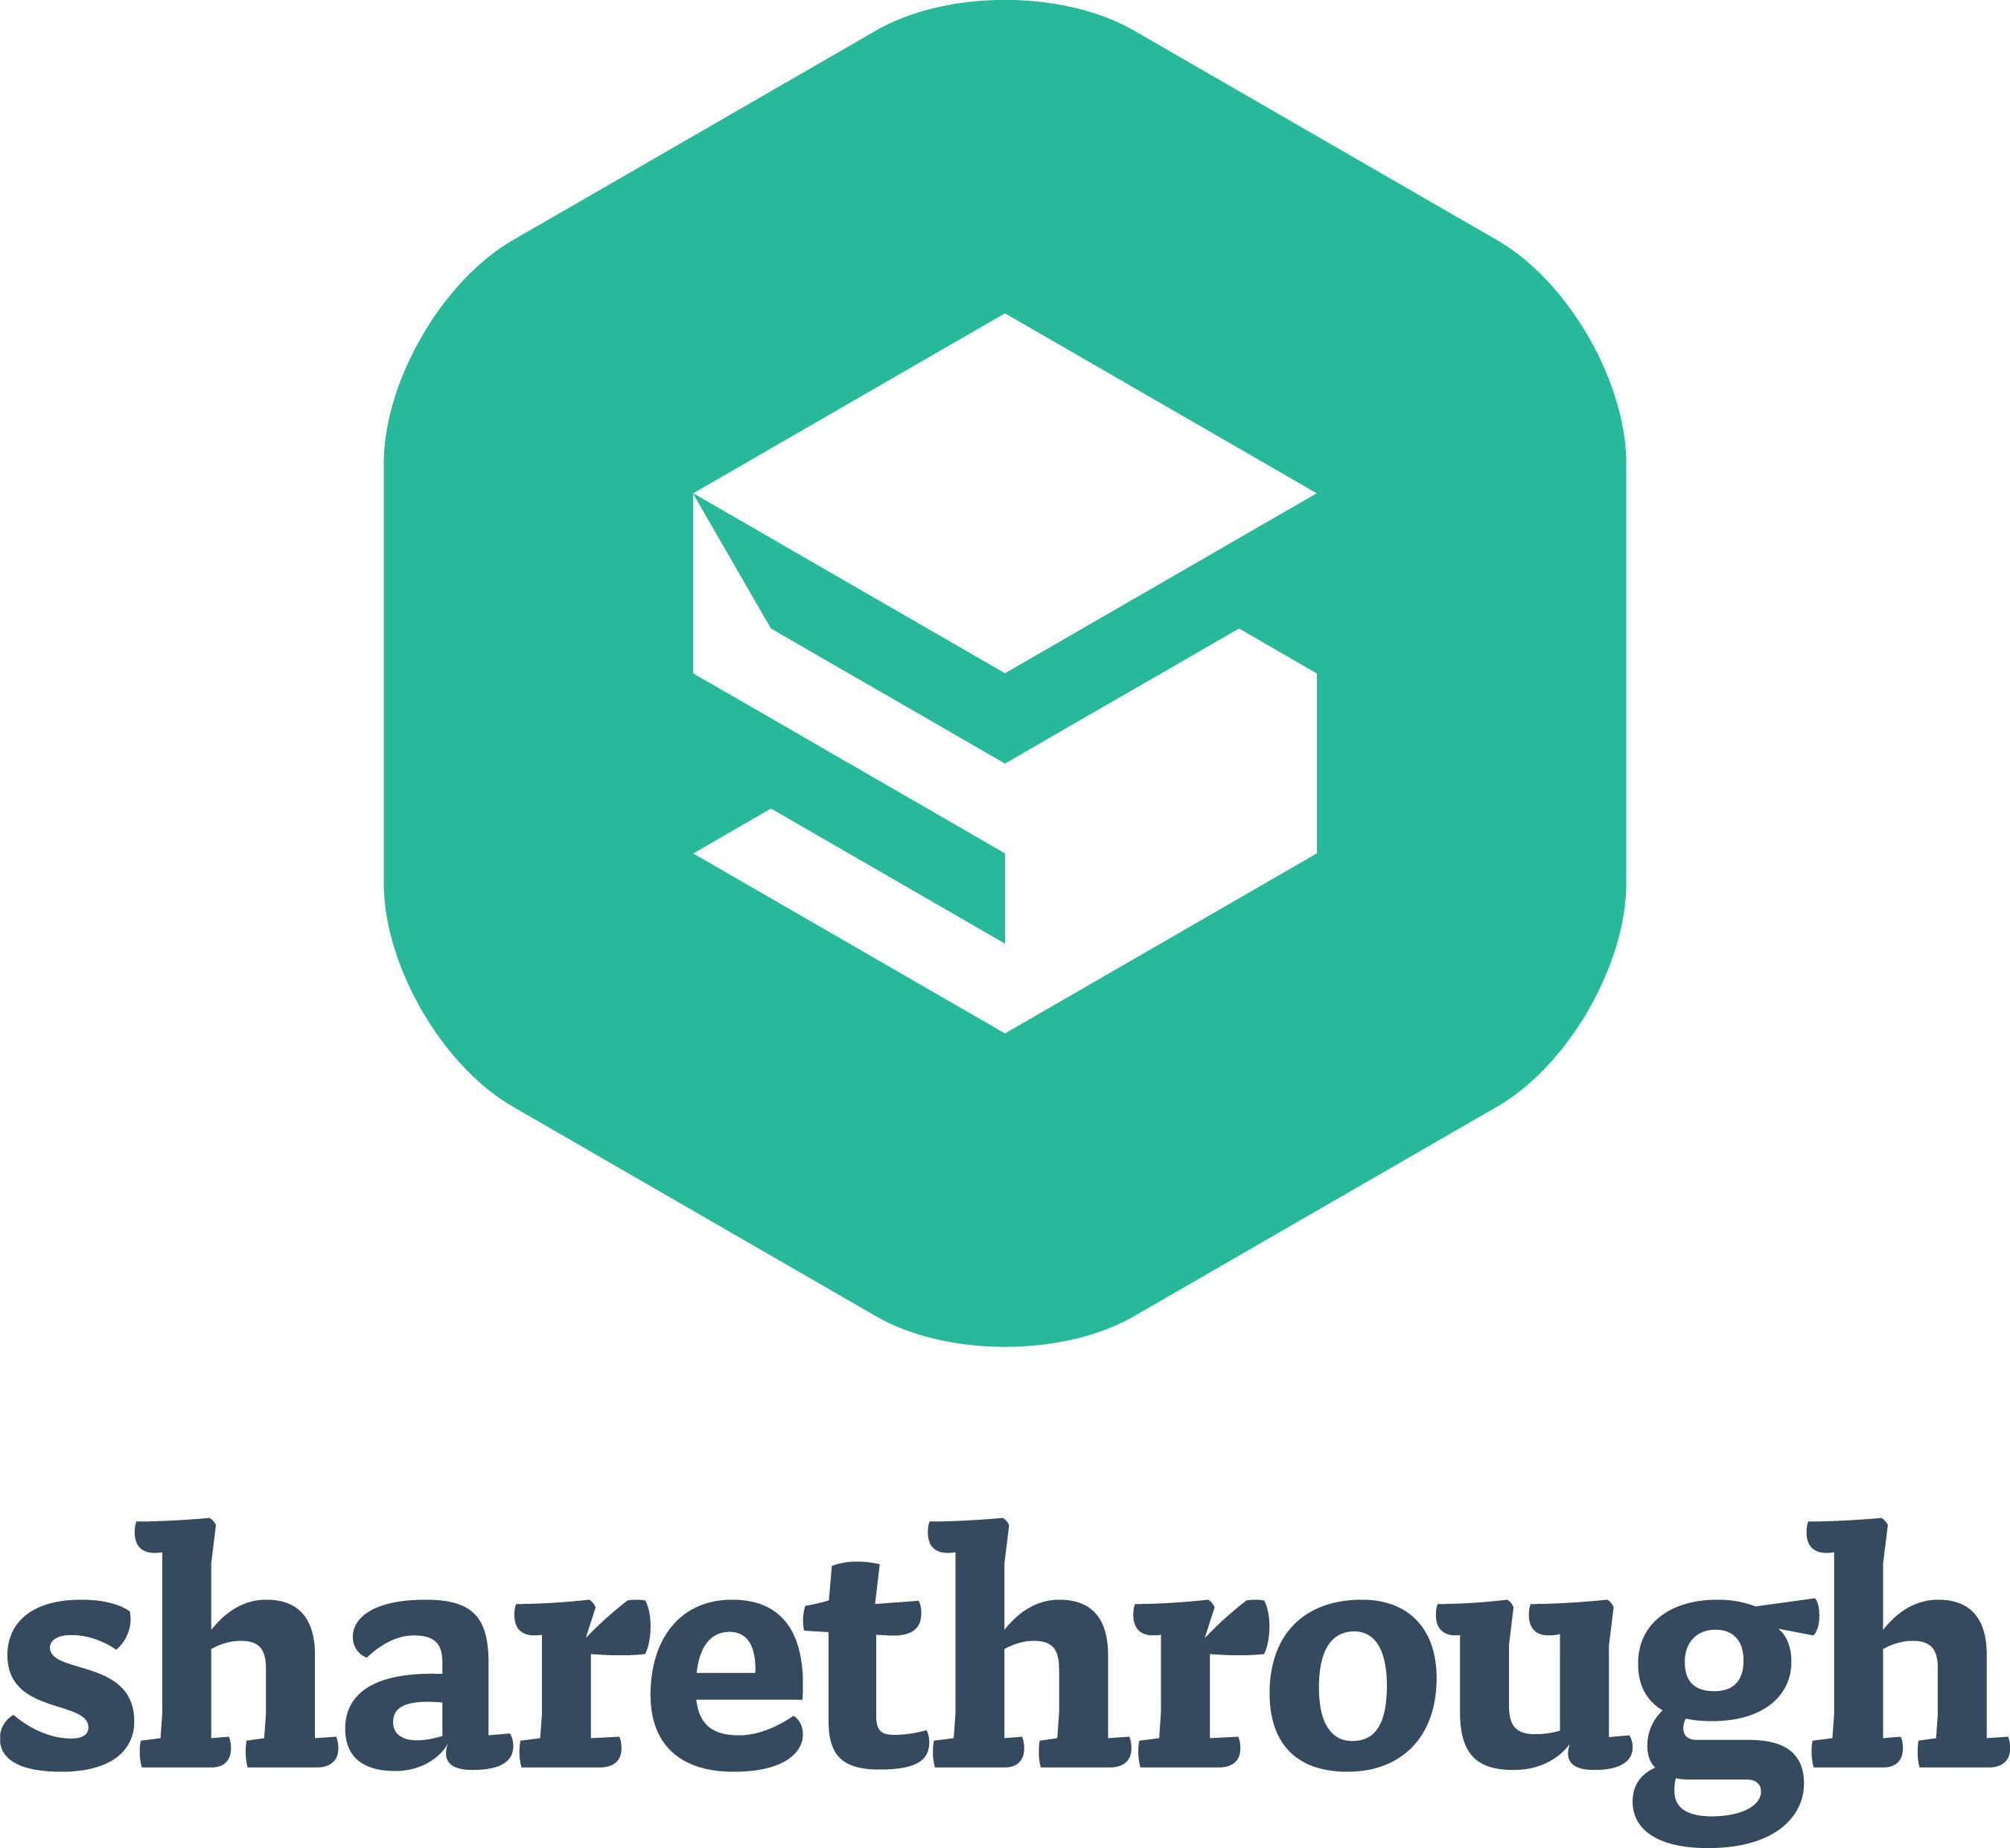 Sharethrough Announces Native Advertising Summit in Chicago. (PRNewsFoto/Sharethrough) (PRNewsFoto/SHARETHROUGH)